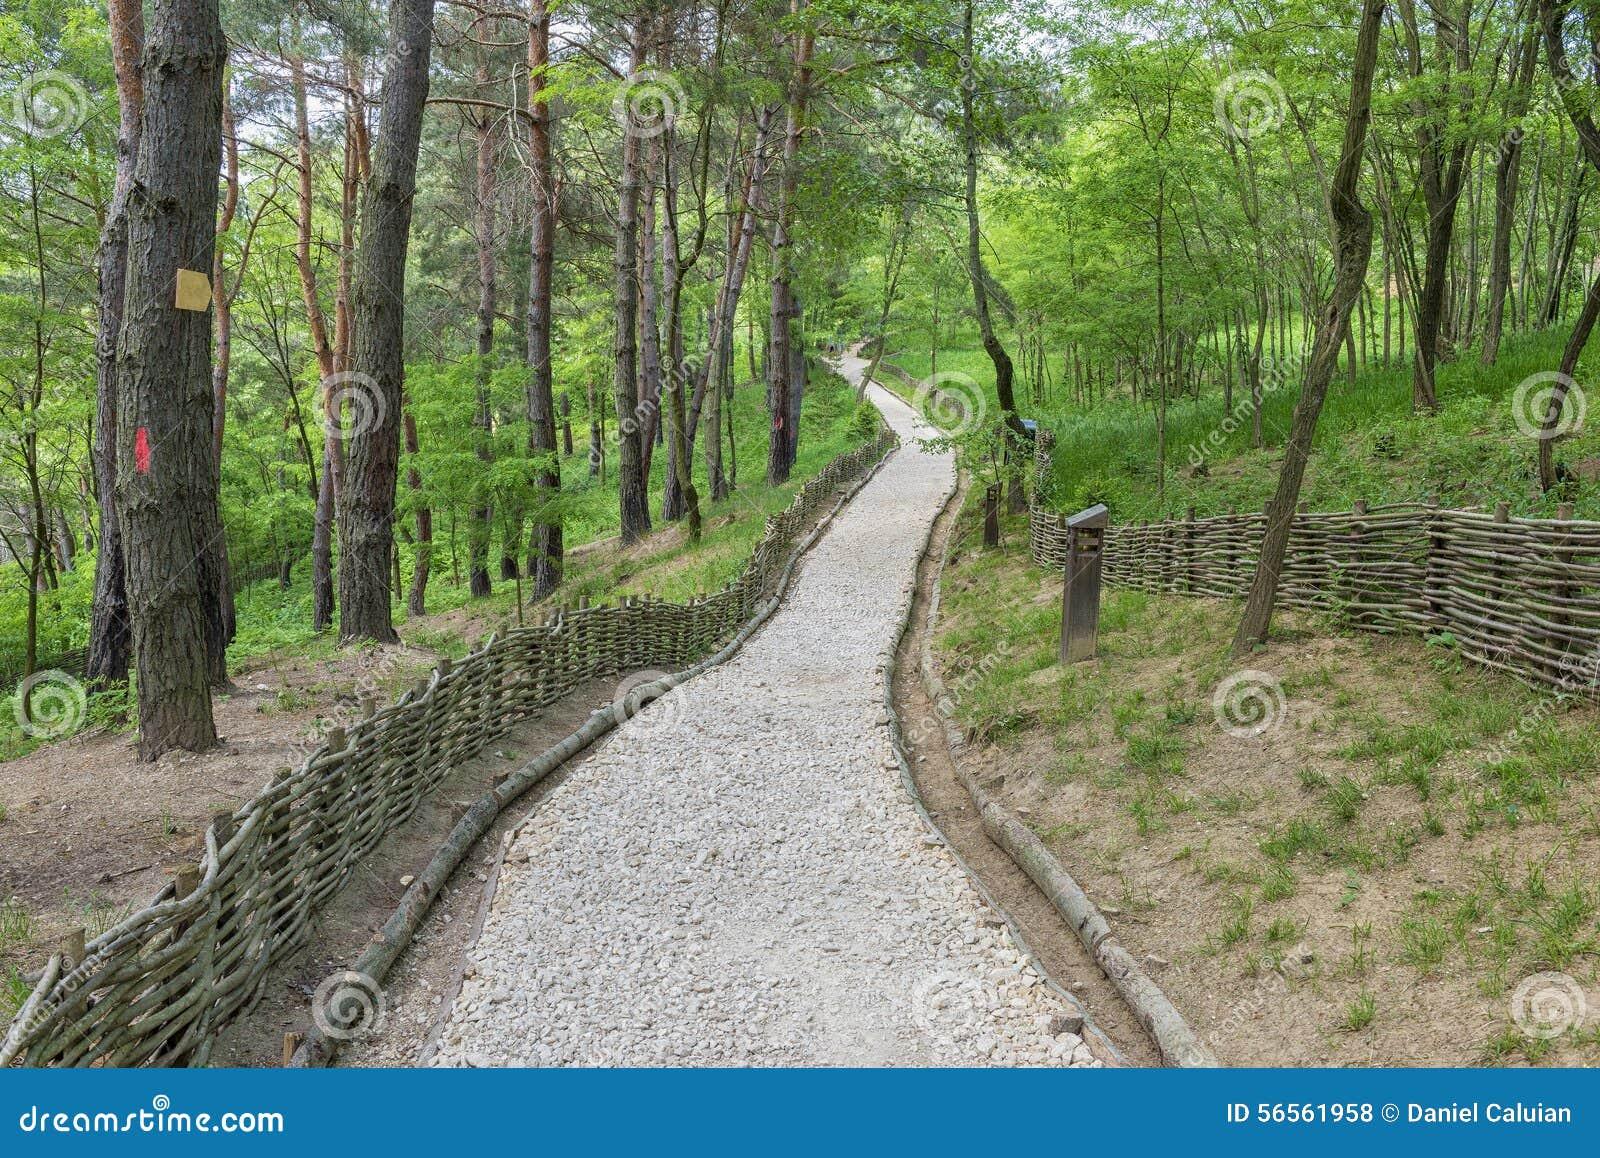 Download Διάβαση που χτίζεται των μικρών πετρών στο δάσος Στοκ Εικόνες - εικόνα από μονοπάτι, ταξίδι: 56561958